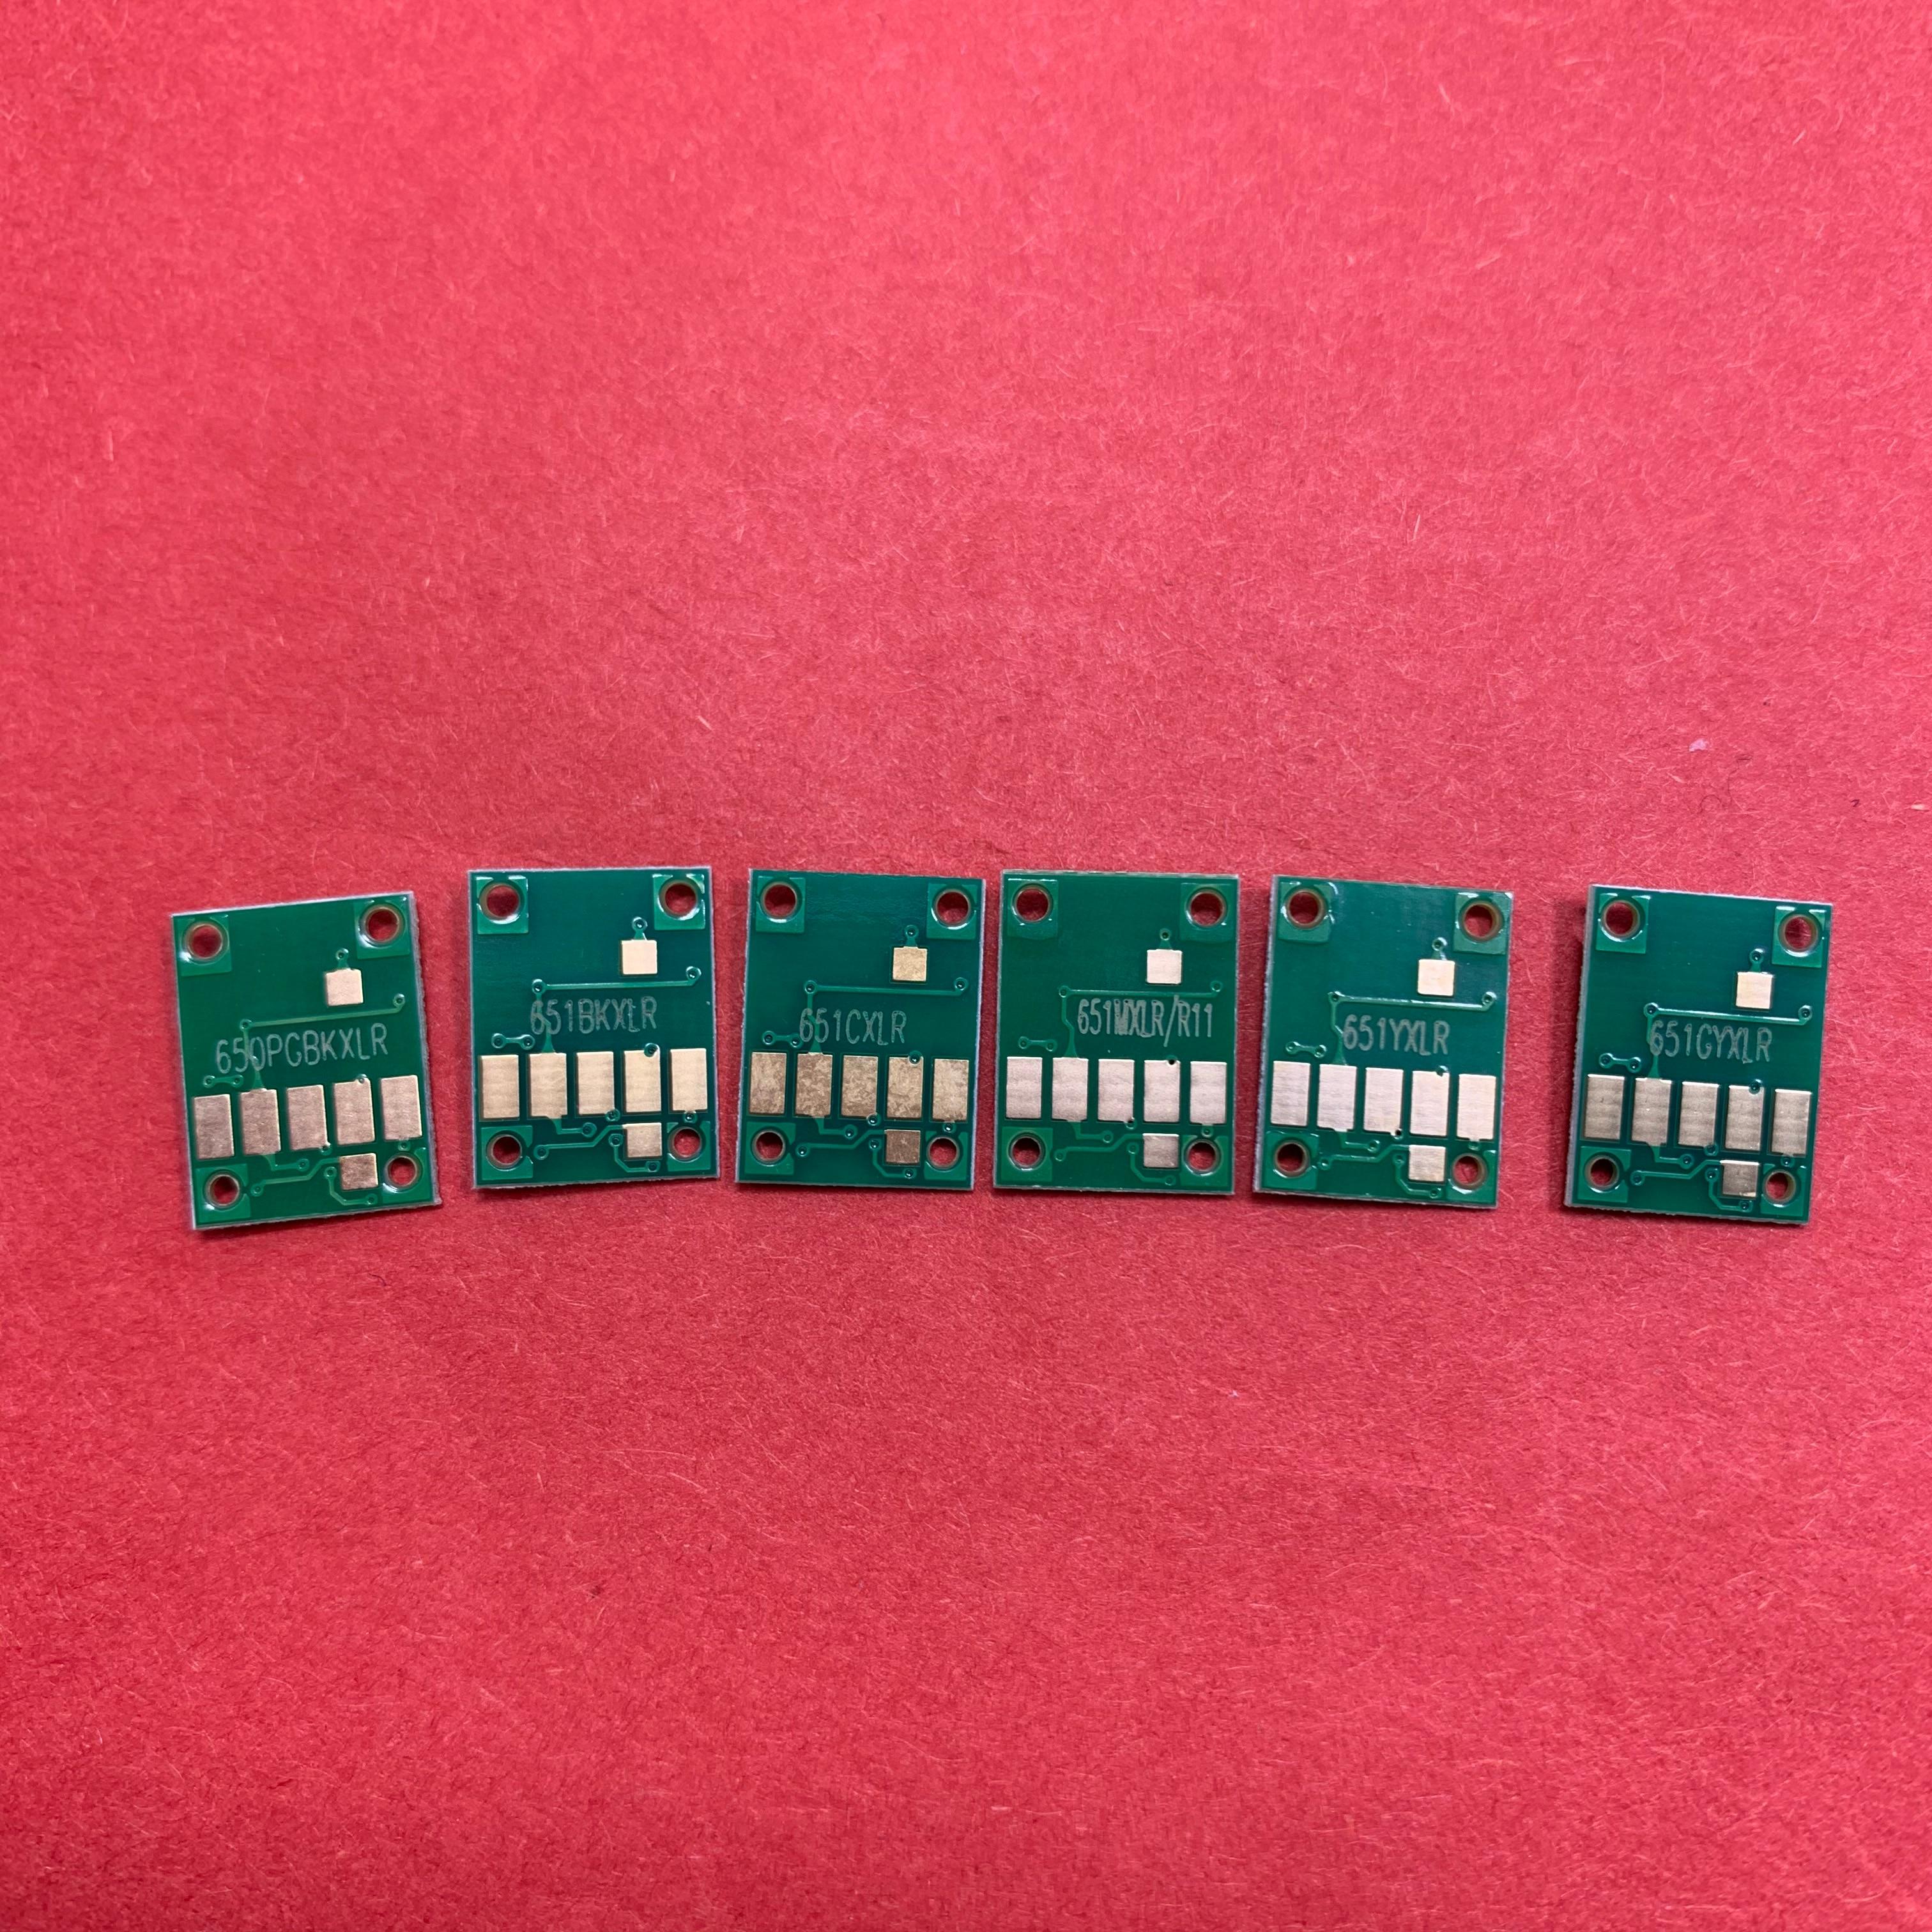 YOTAT 6 uds PGI-650 de chip permanente CLI-651 para impresora Canon PIXMA MG6360